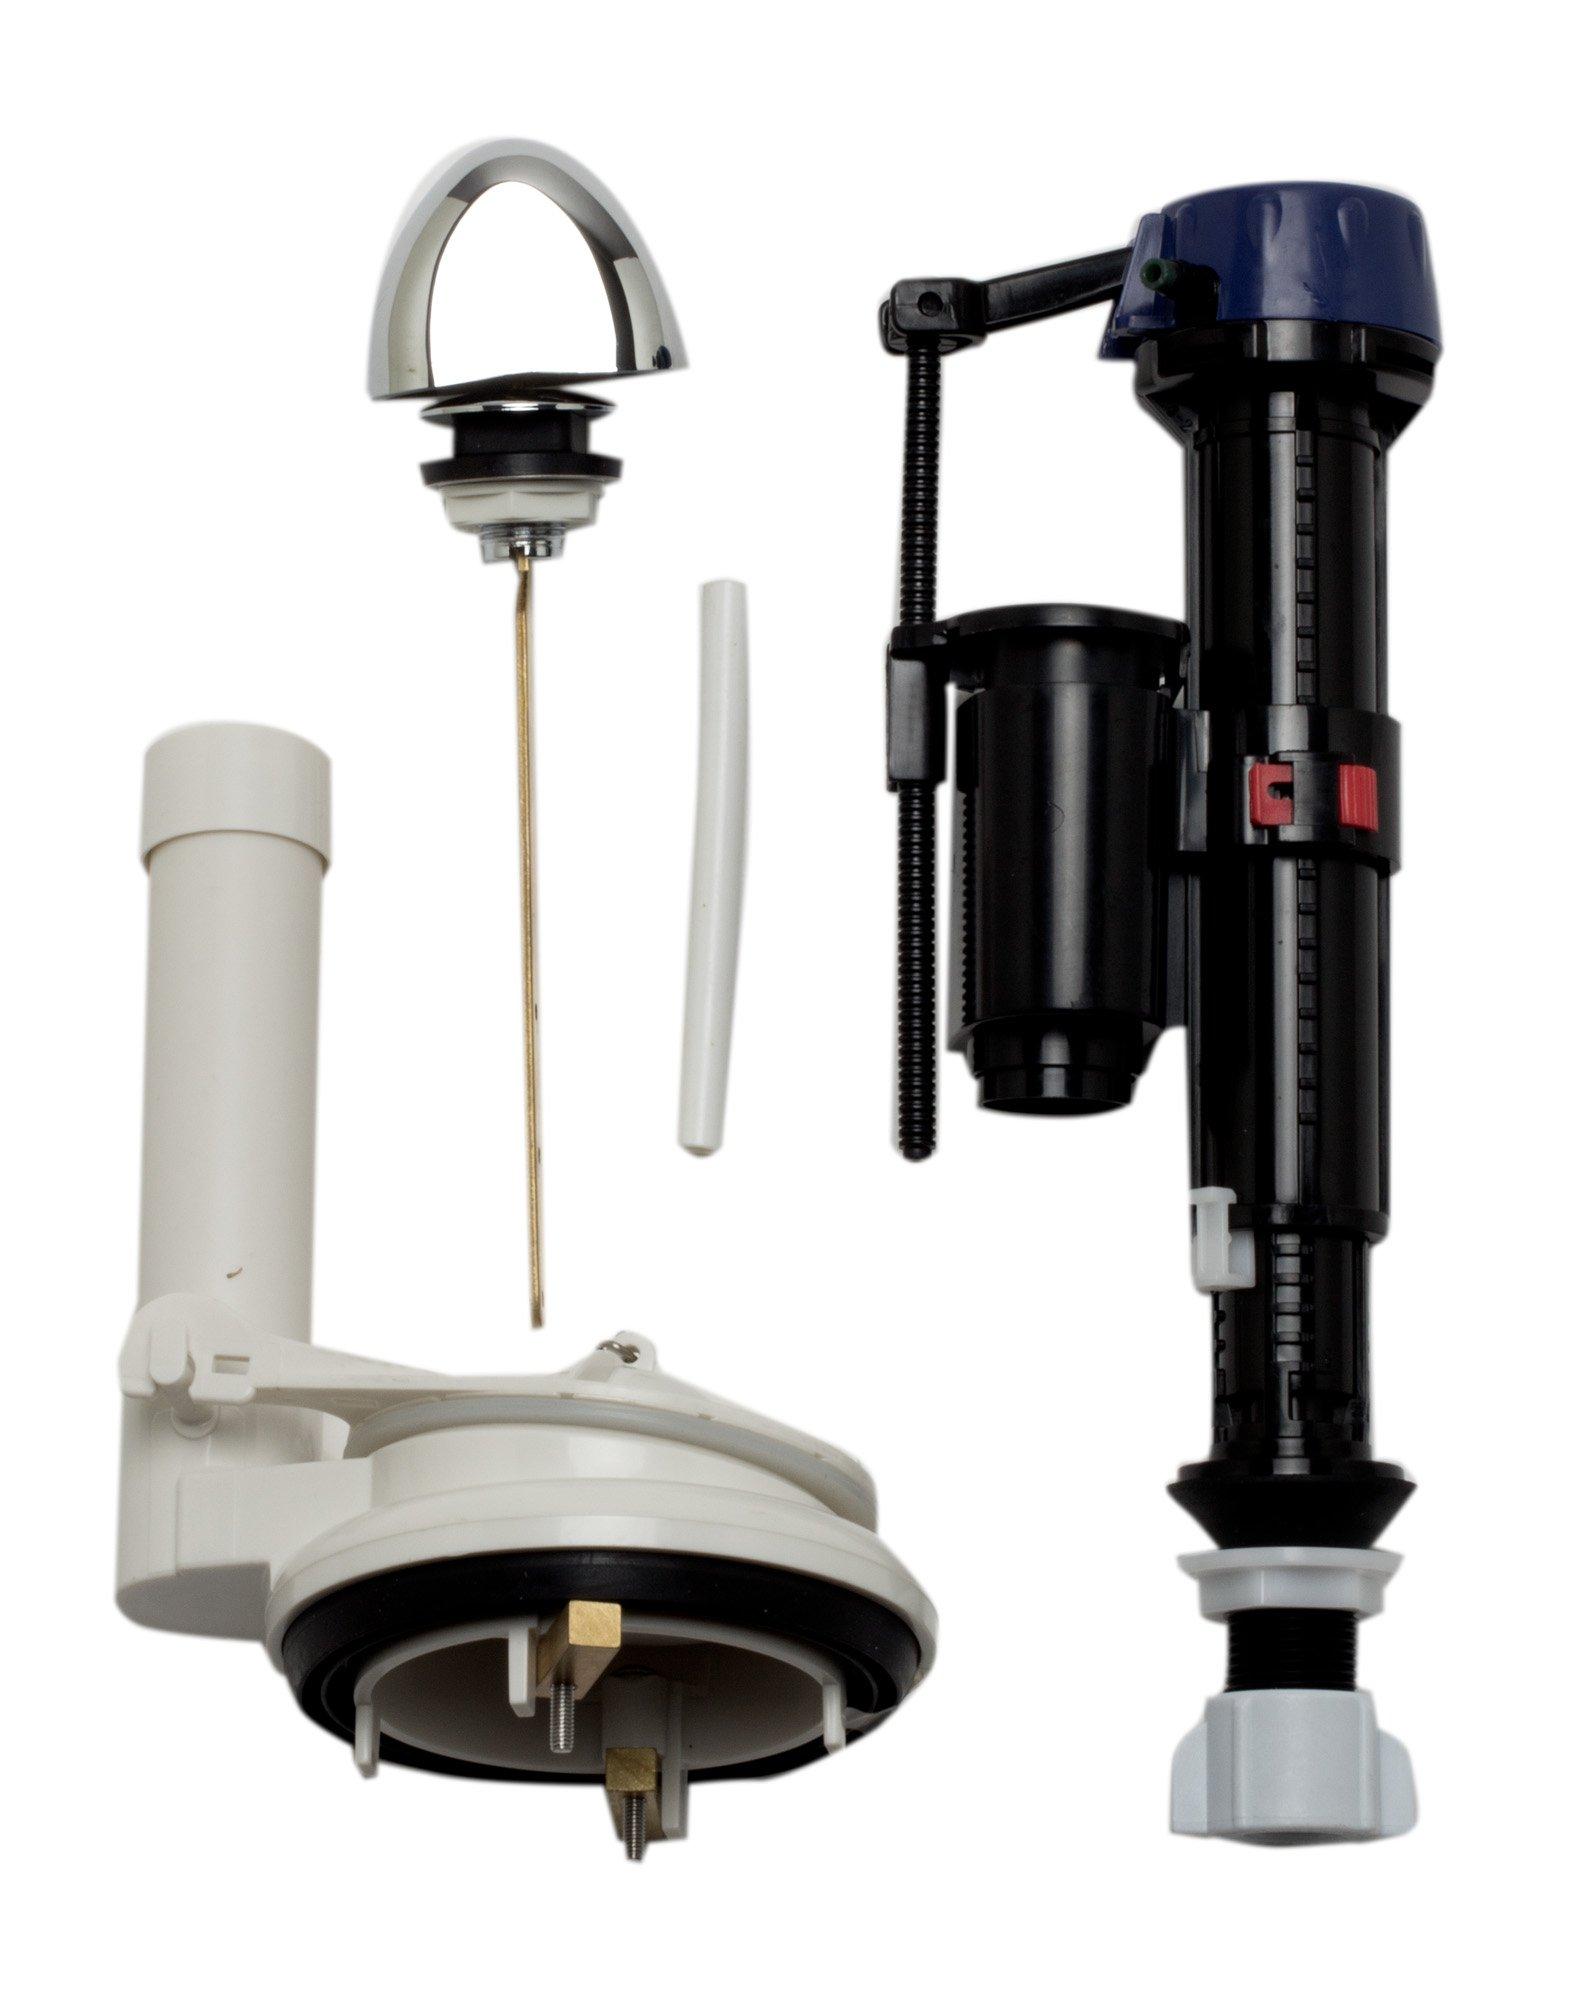 EAGO R-326FLUSH Replacement Toilet Flushing Mechanism for TB326 by EAGO